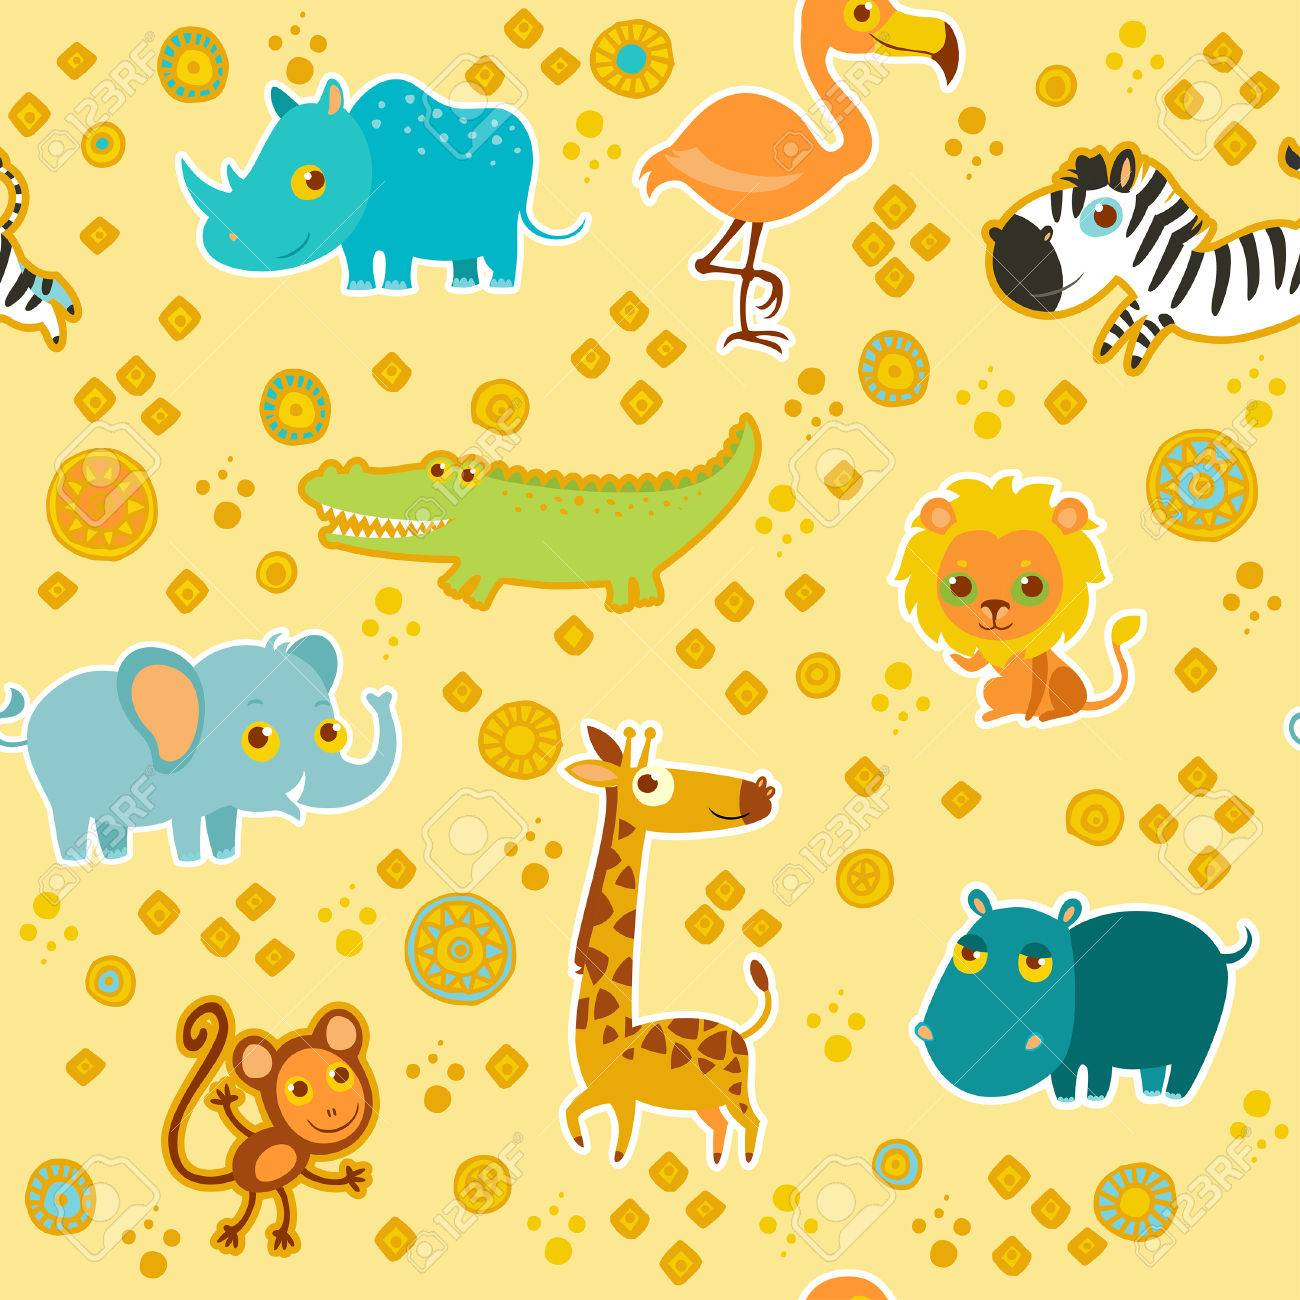 African cartoon animal vector seamless pattern. Stock Vector - 24577849